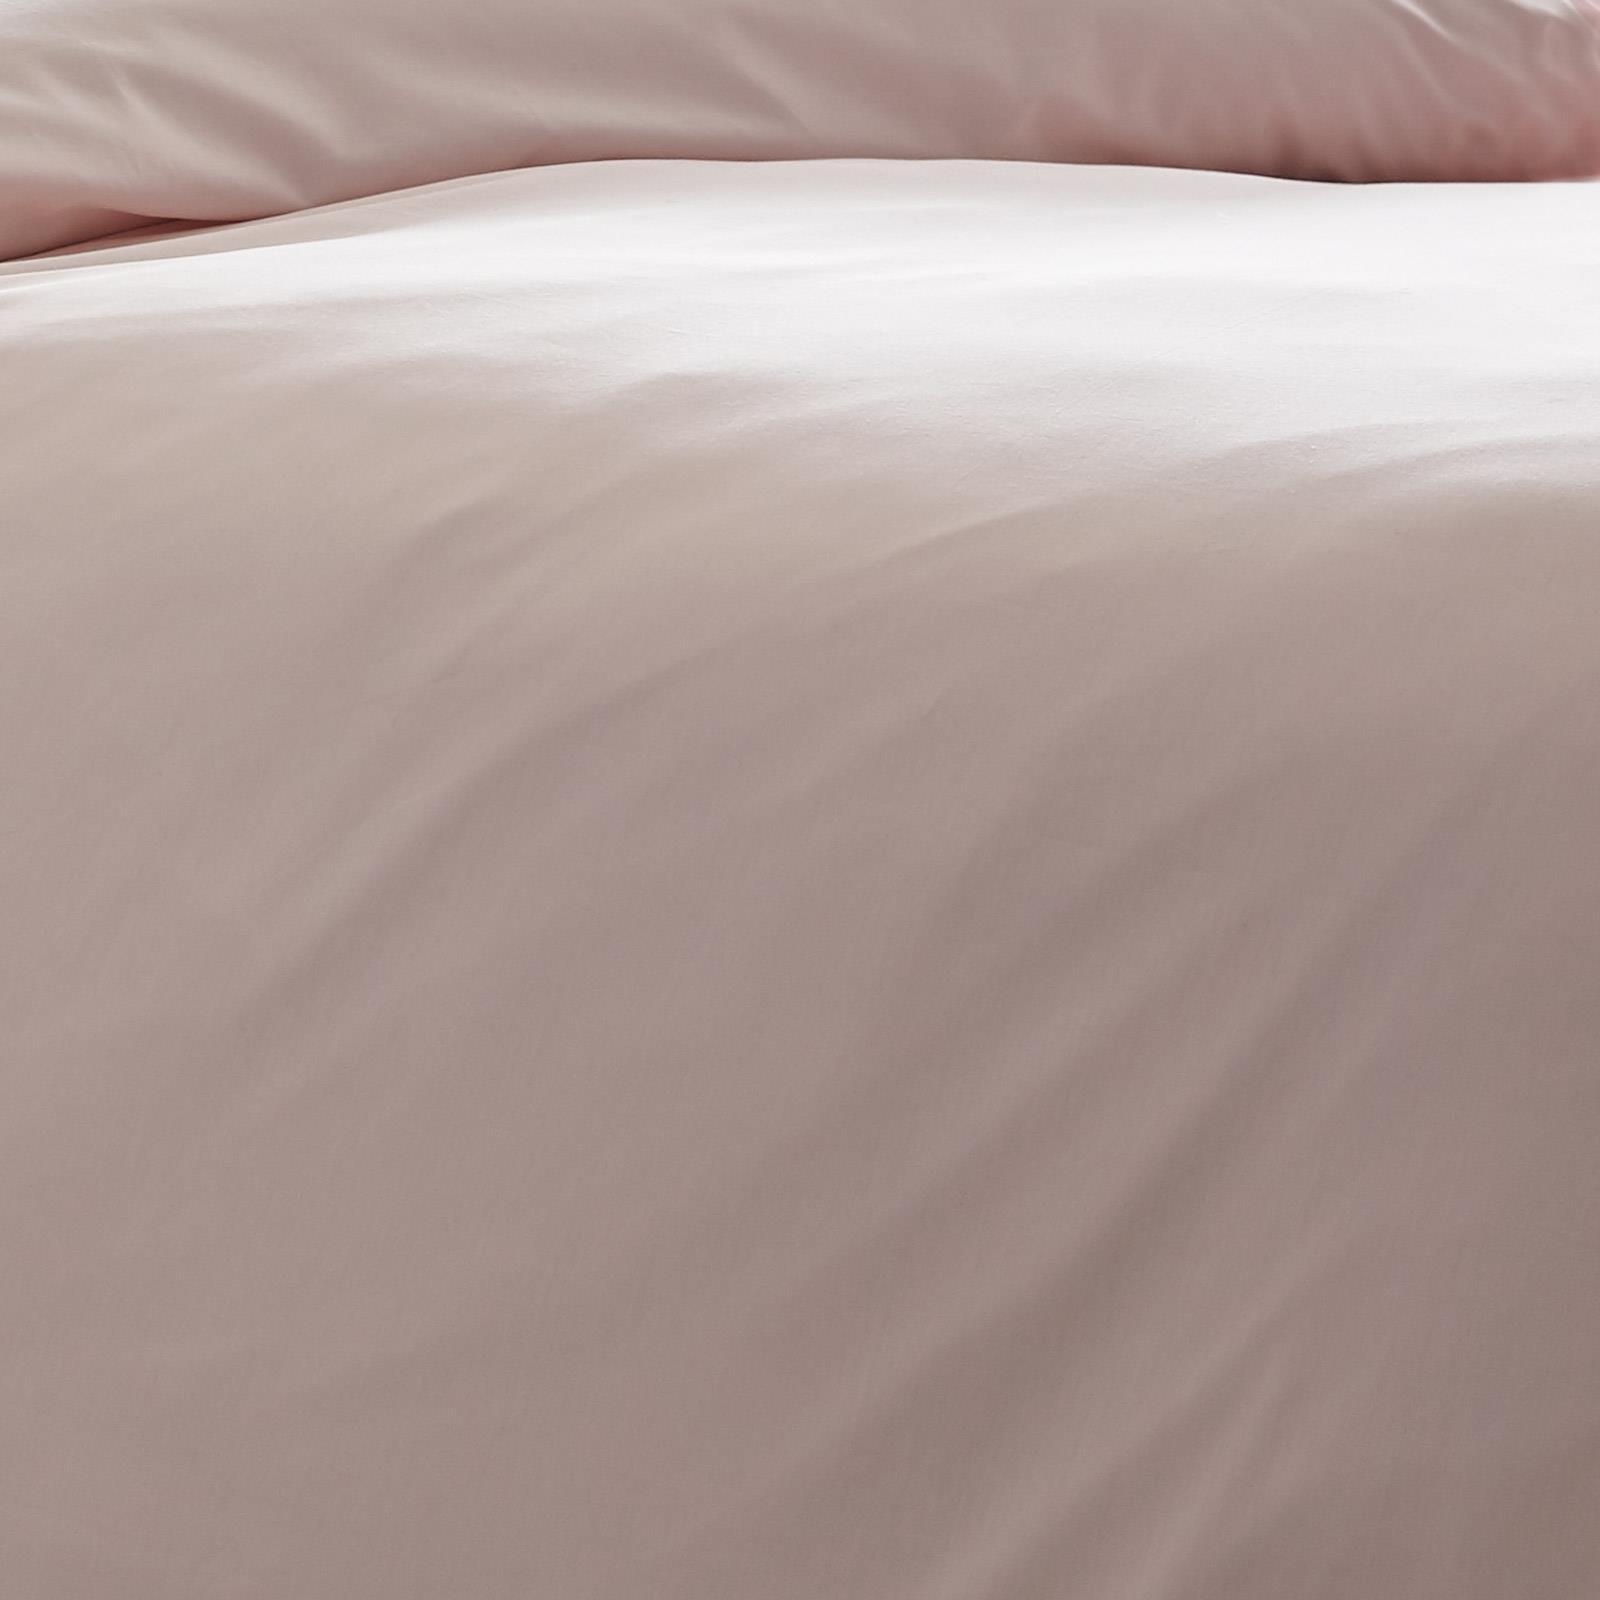 Blush-fundas-nordicas-Rosa-100-algodon-200-Hilos-Llano-Edredon-Conjuntos-de-Cama miniatura 15